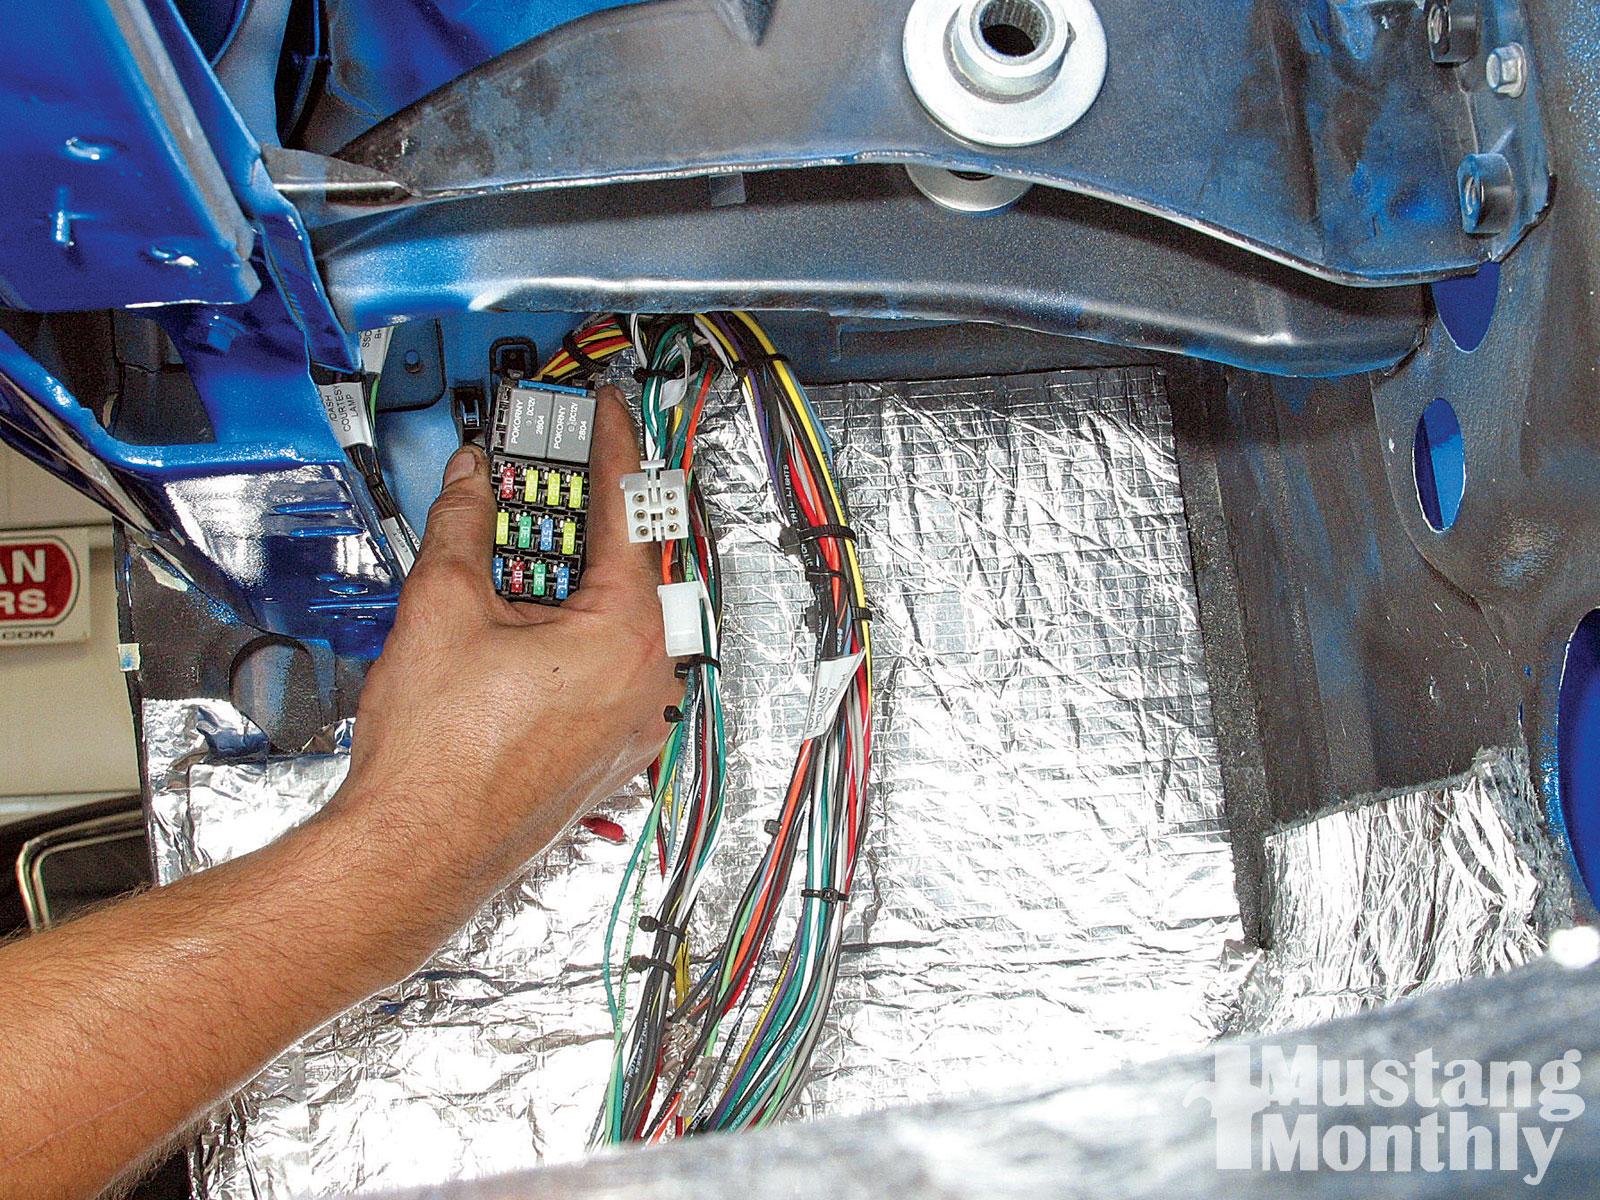 mump 1002 10 o 1965 ford mustang fastback install fuse box 2 [ 1600 x 1200 Pixel ]